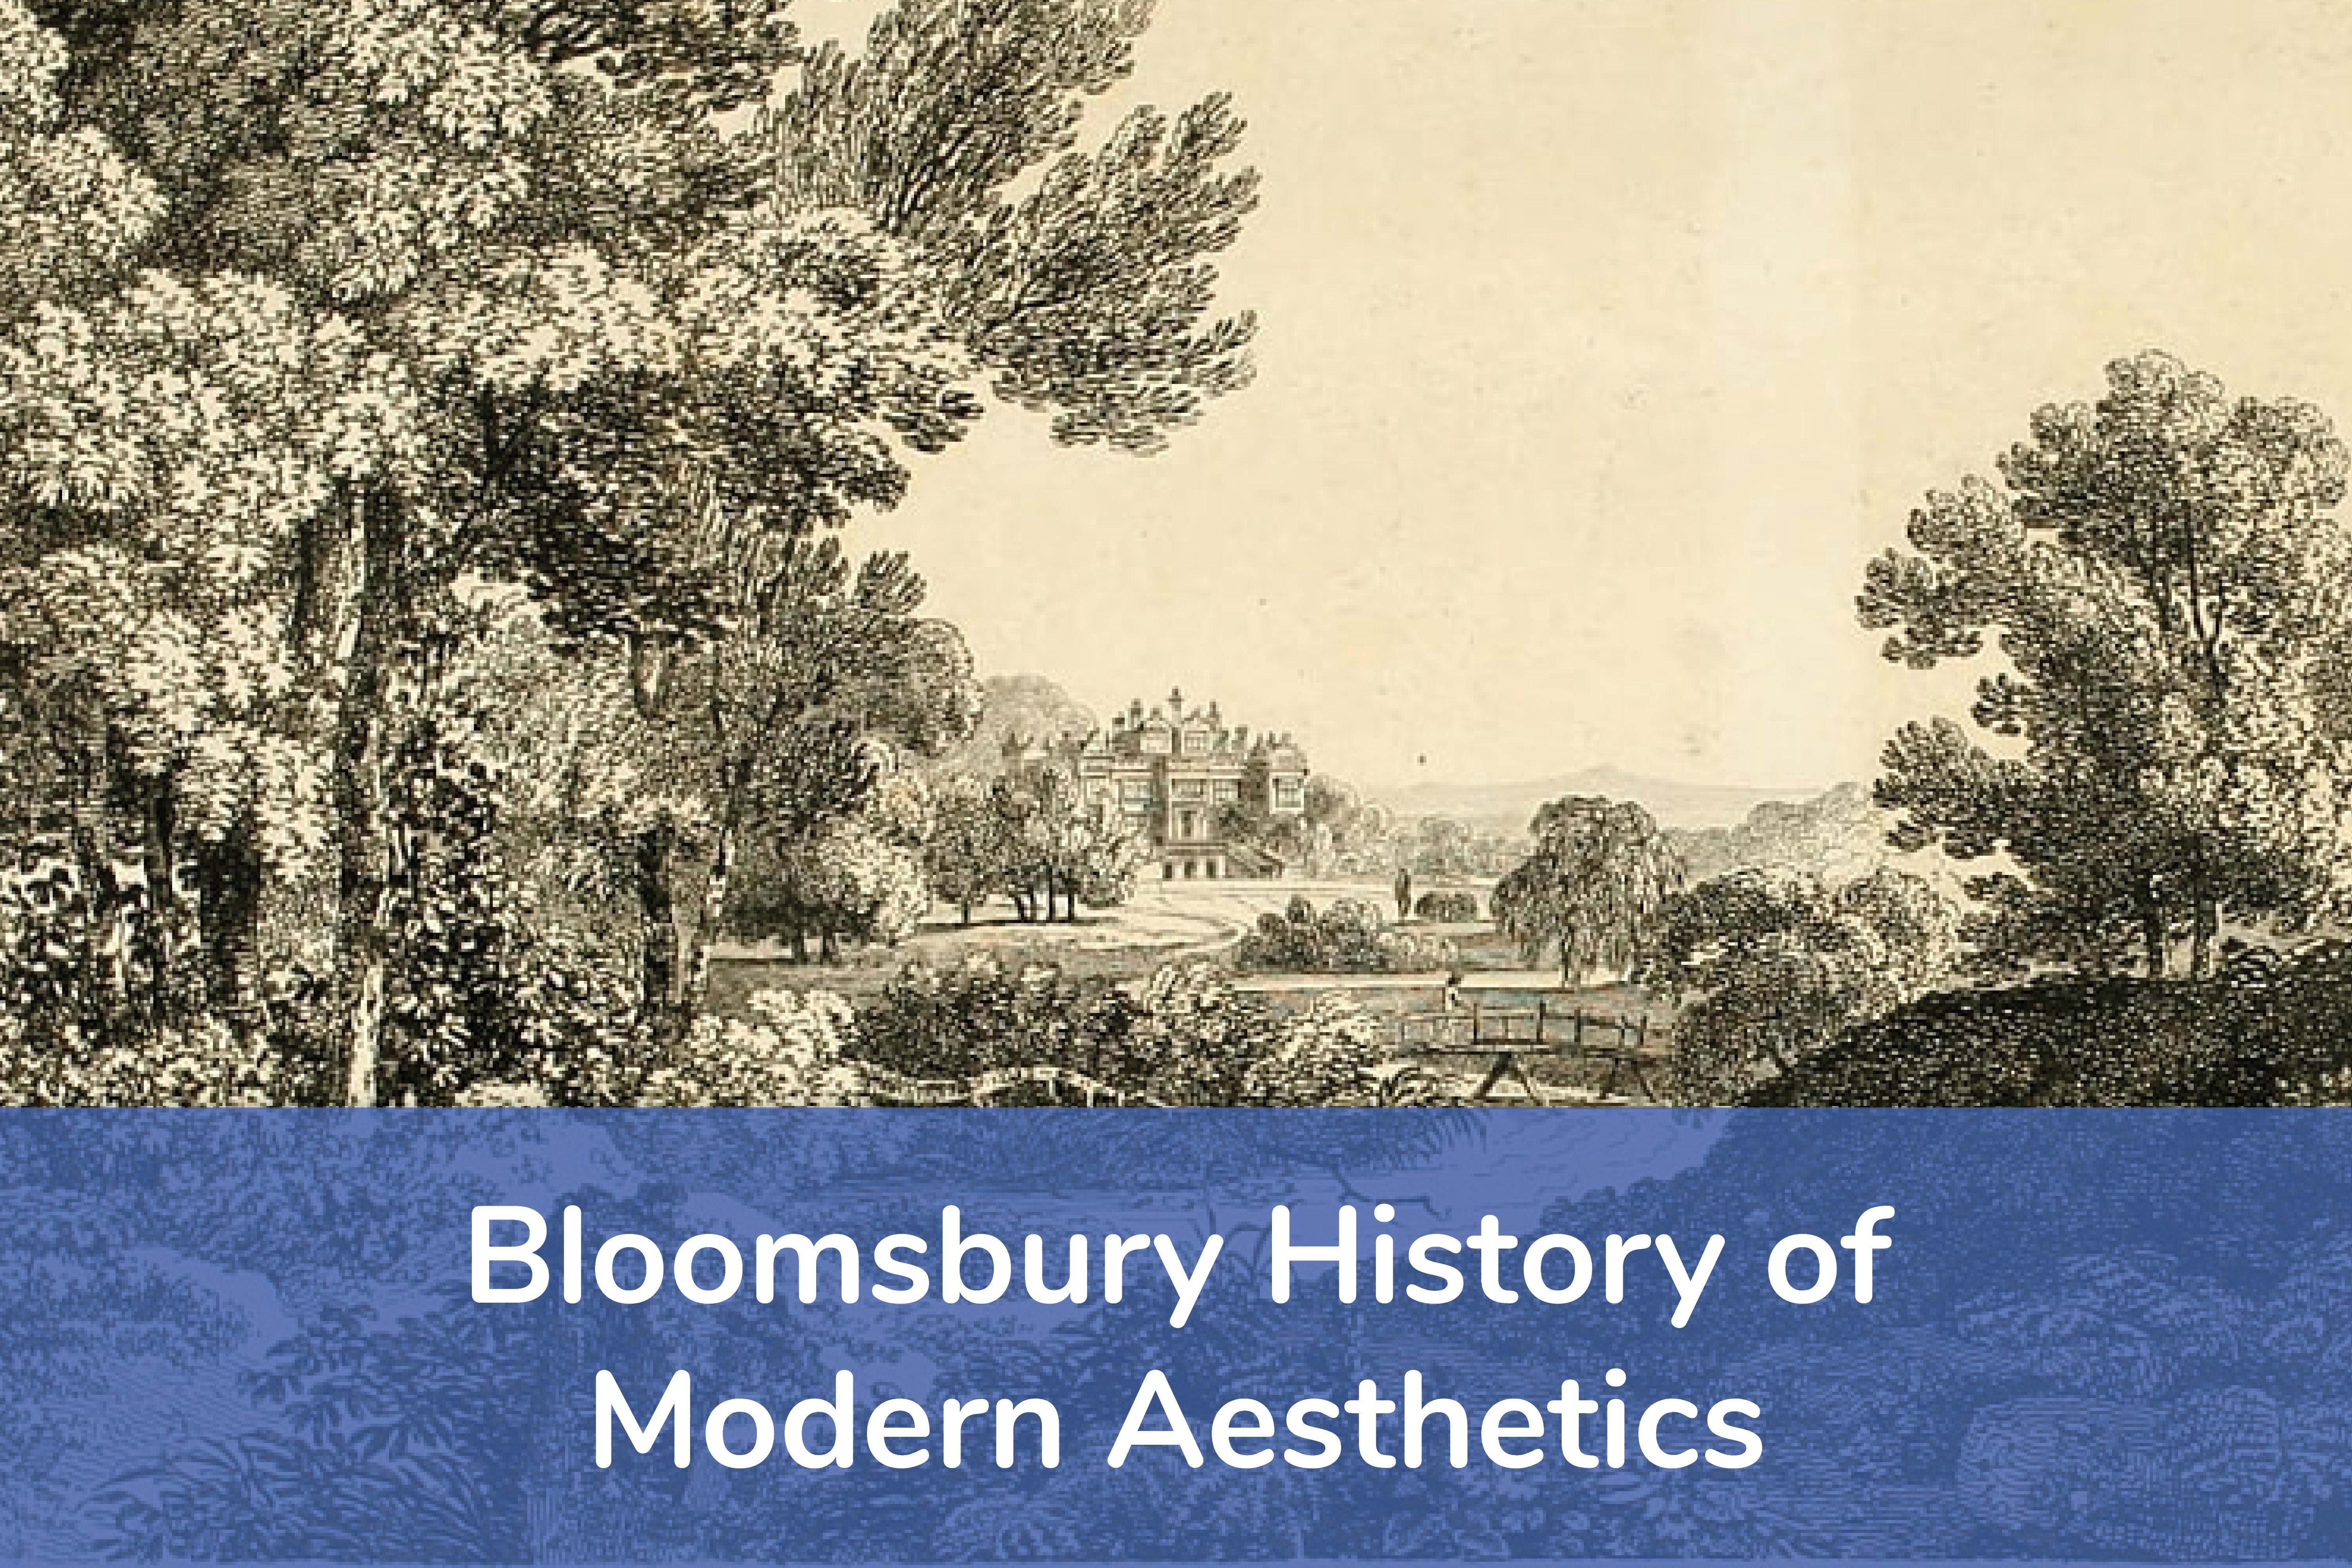 Bloomsbury History of Modern Aesthetics